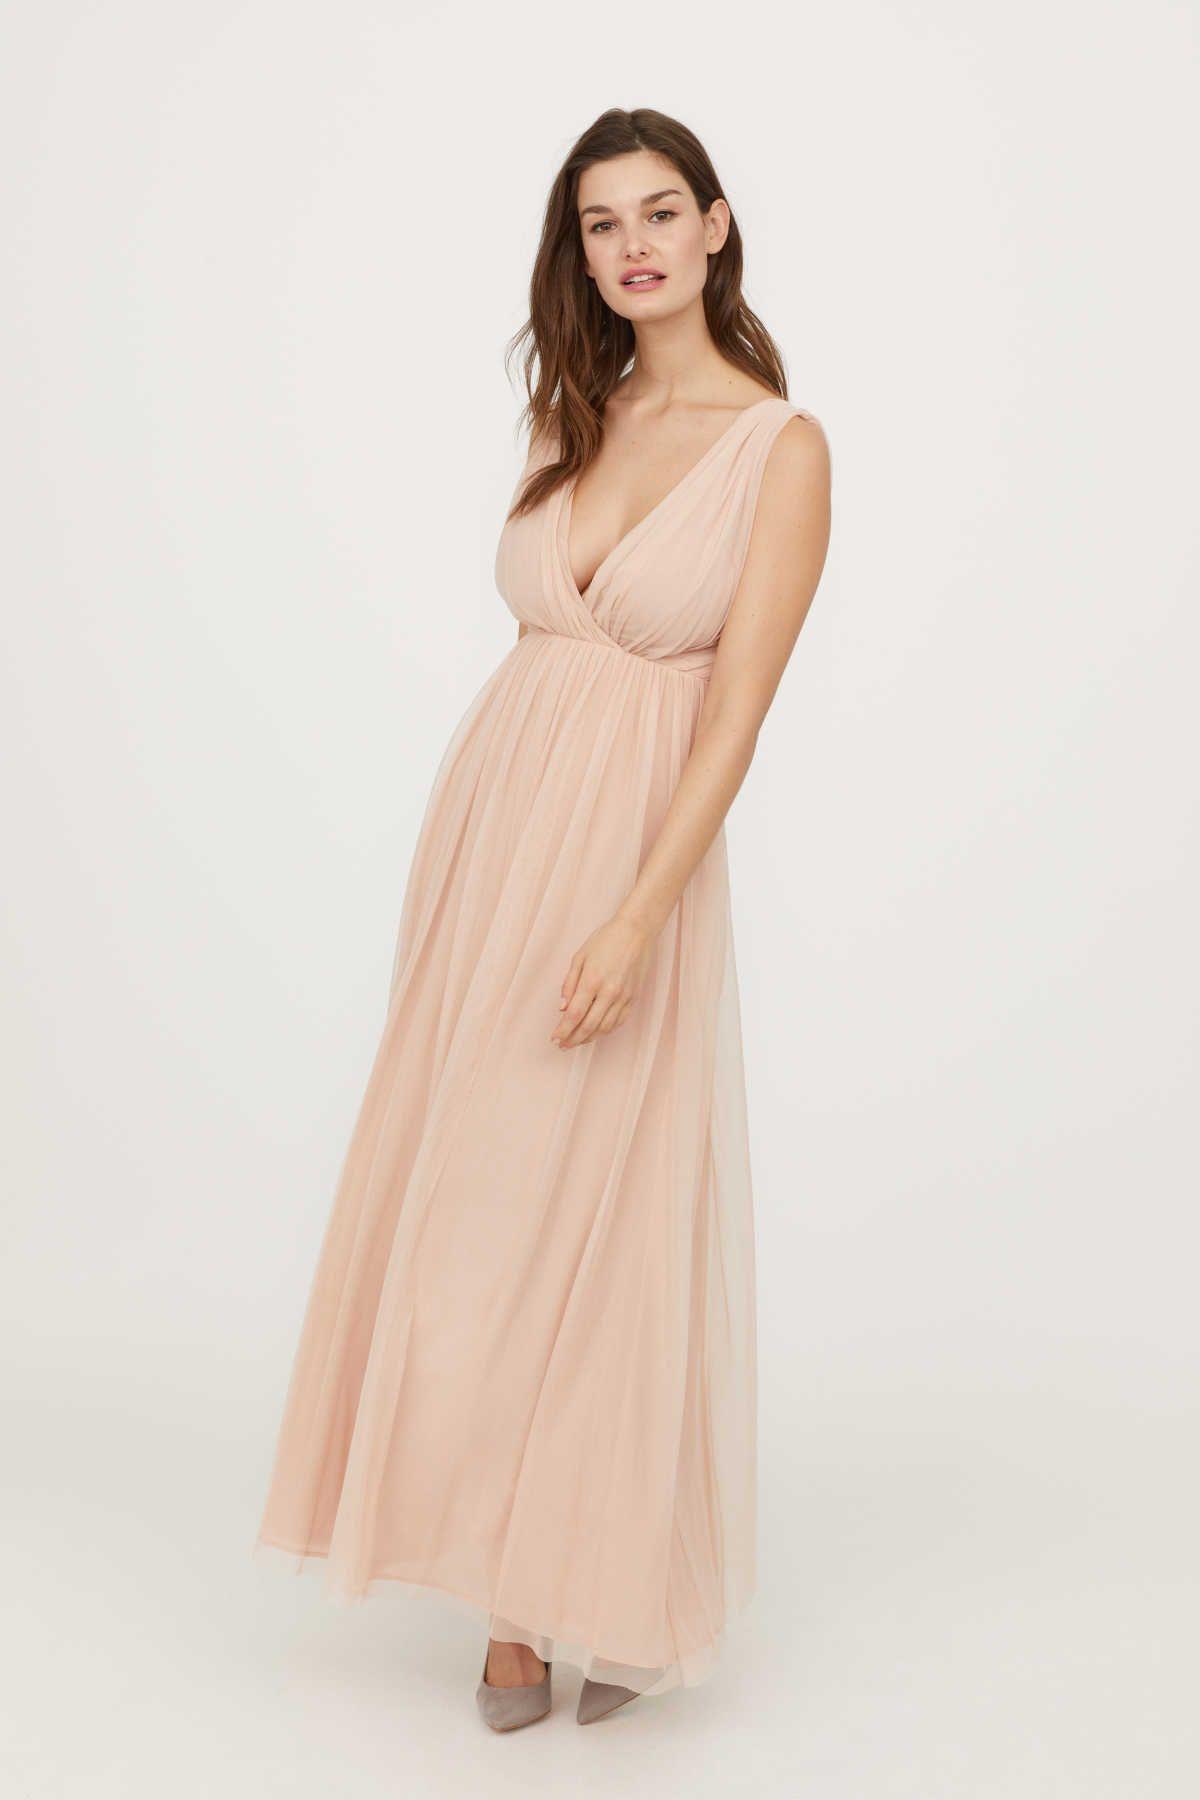 H M Long Dresses